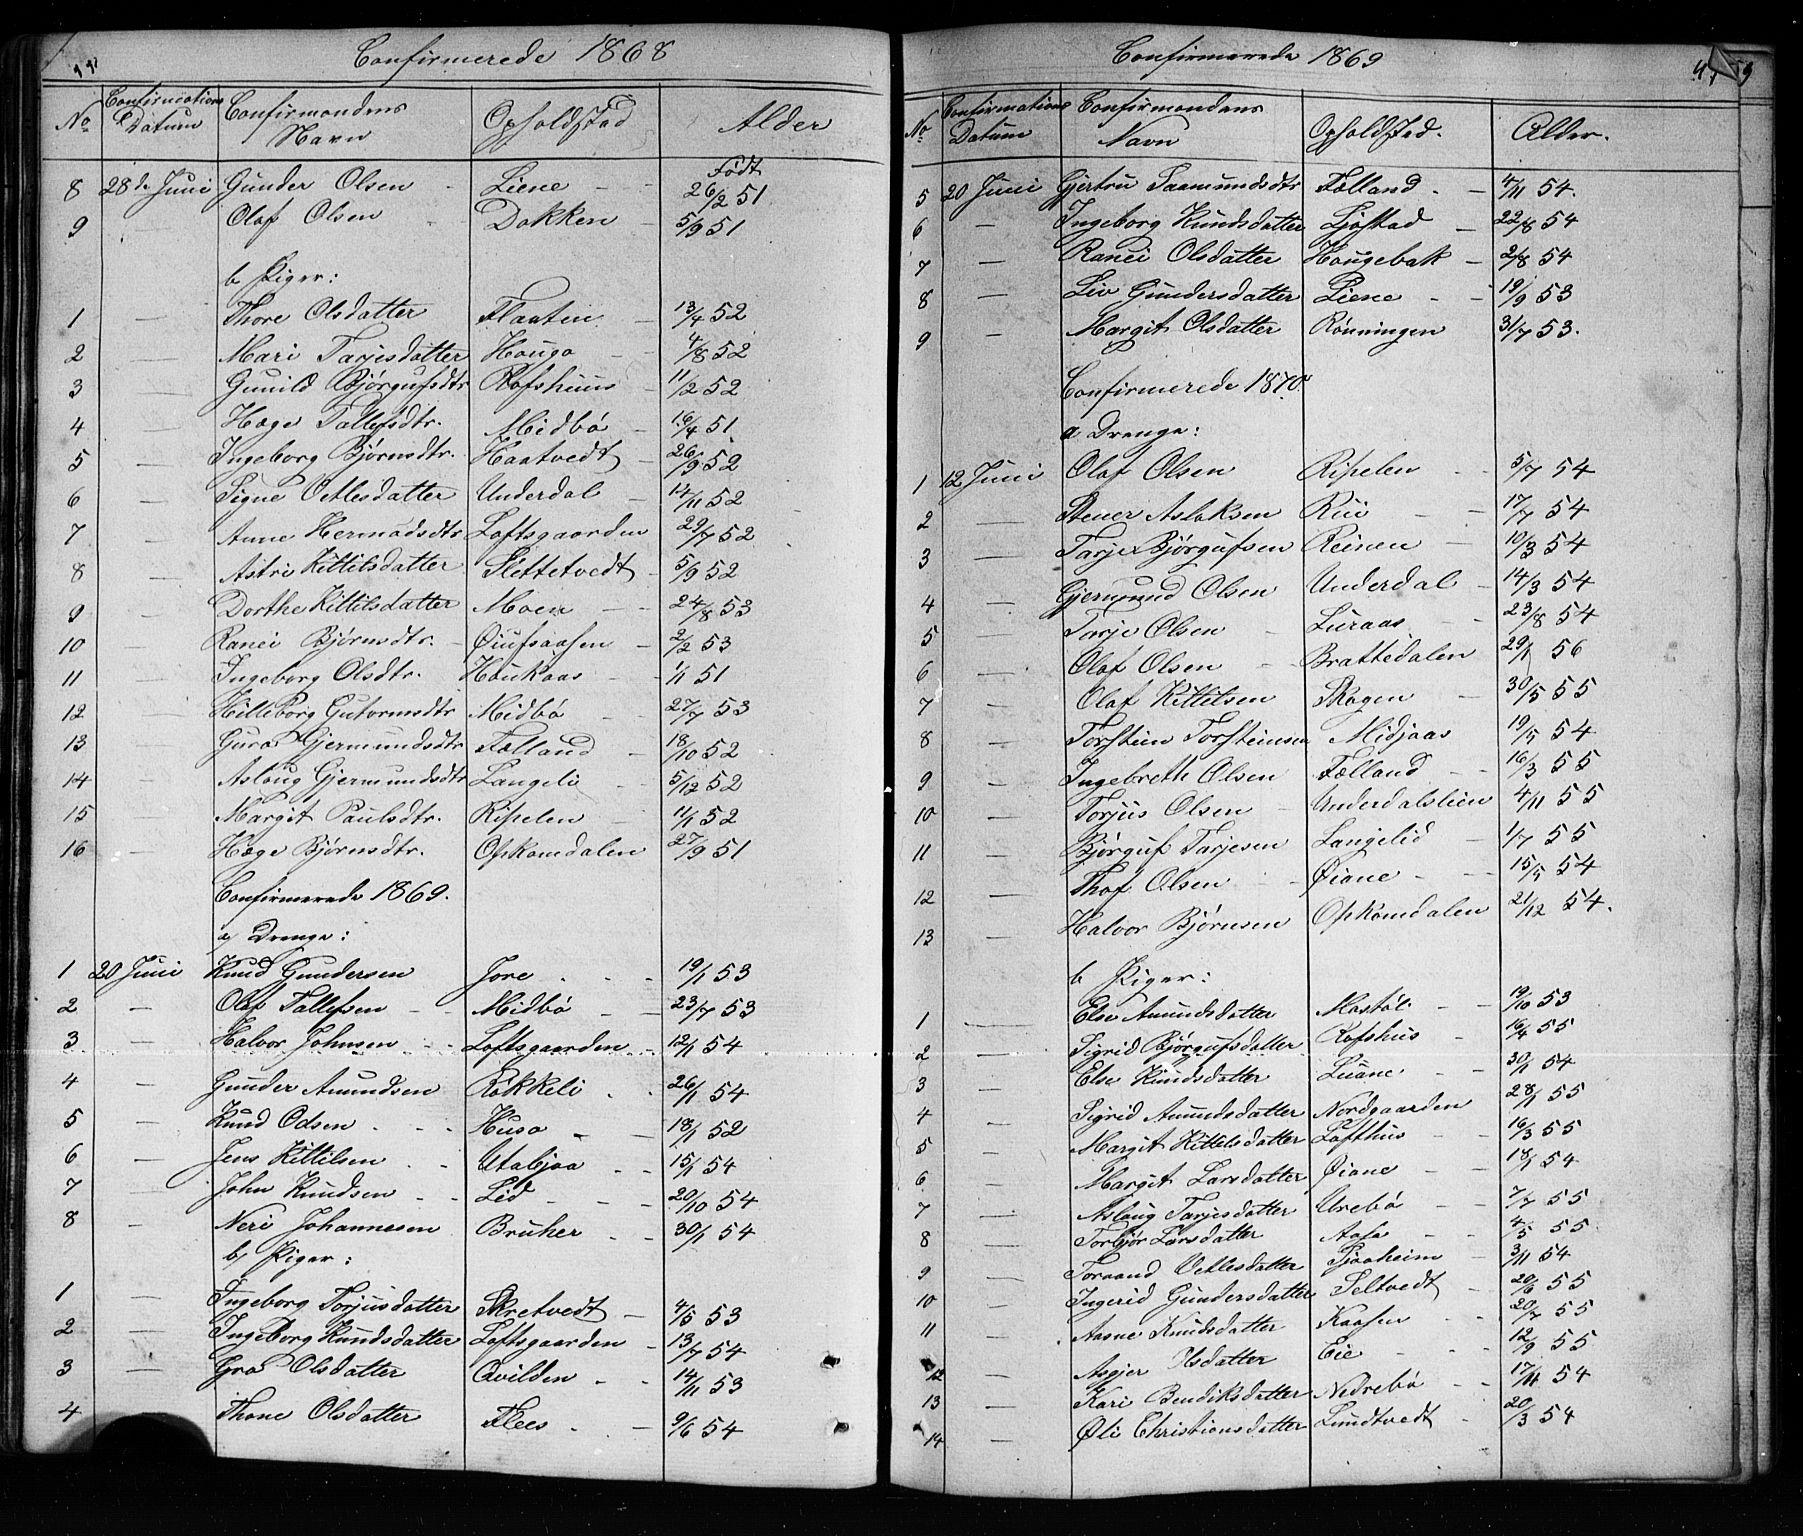 SAKO, Mo kirkebøker, G/Ga/L0001: Klokkerbok nr. I 1, 1851-1891, s. 47